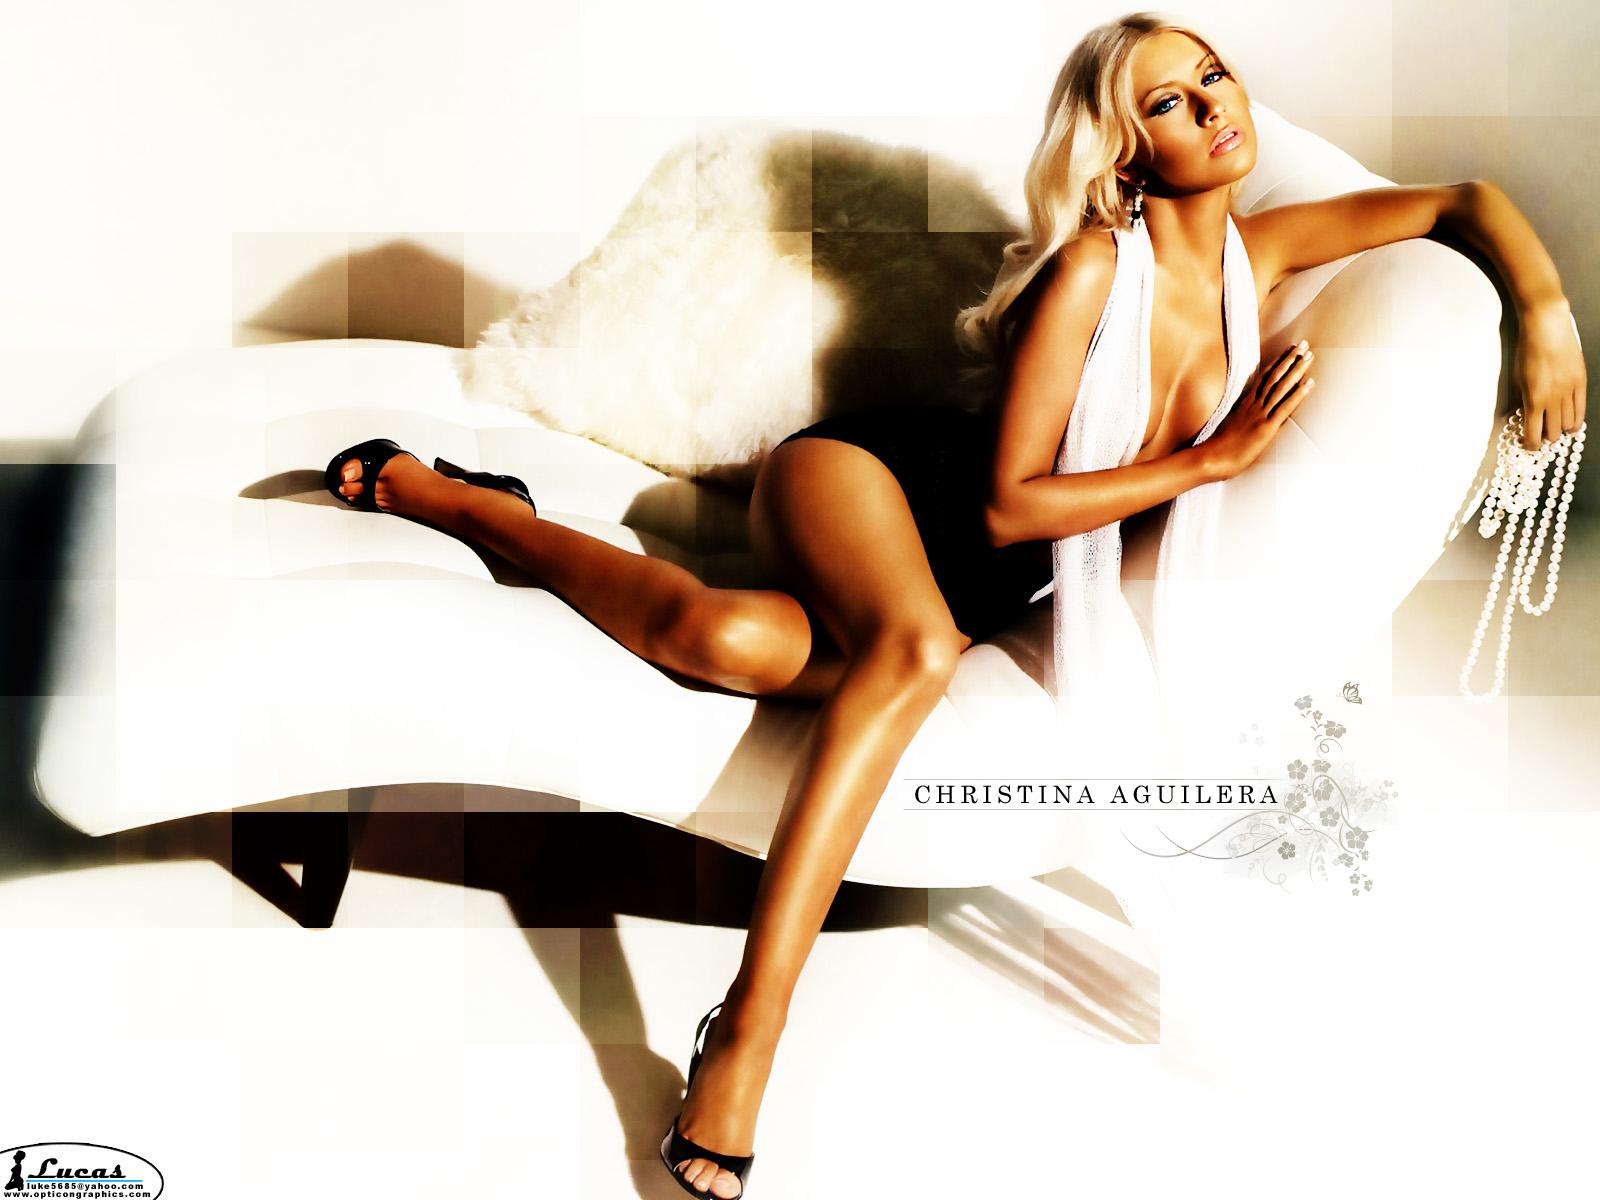 http://1.bp.blogspot.com/_IBYCzpEWumk/S8EkIb-QBNI/AAAAAAAABUQ/YpELMpBKzRg/s1600/christina_aguilera_181.jpg